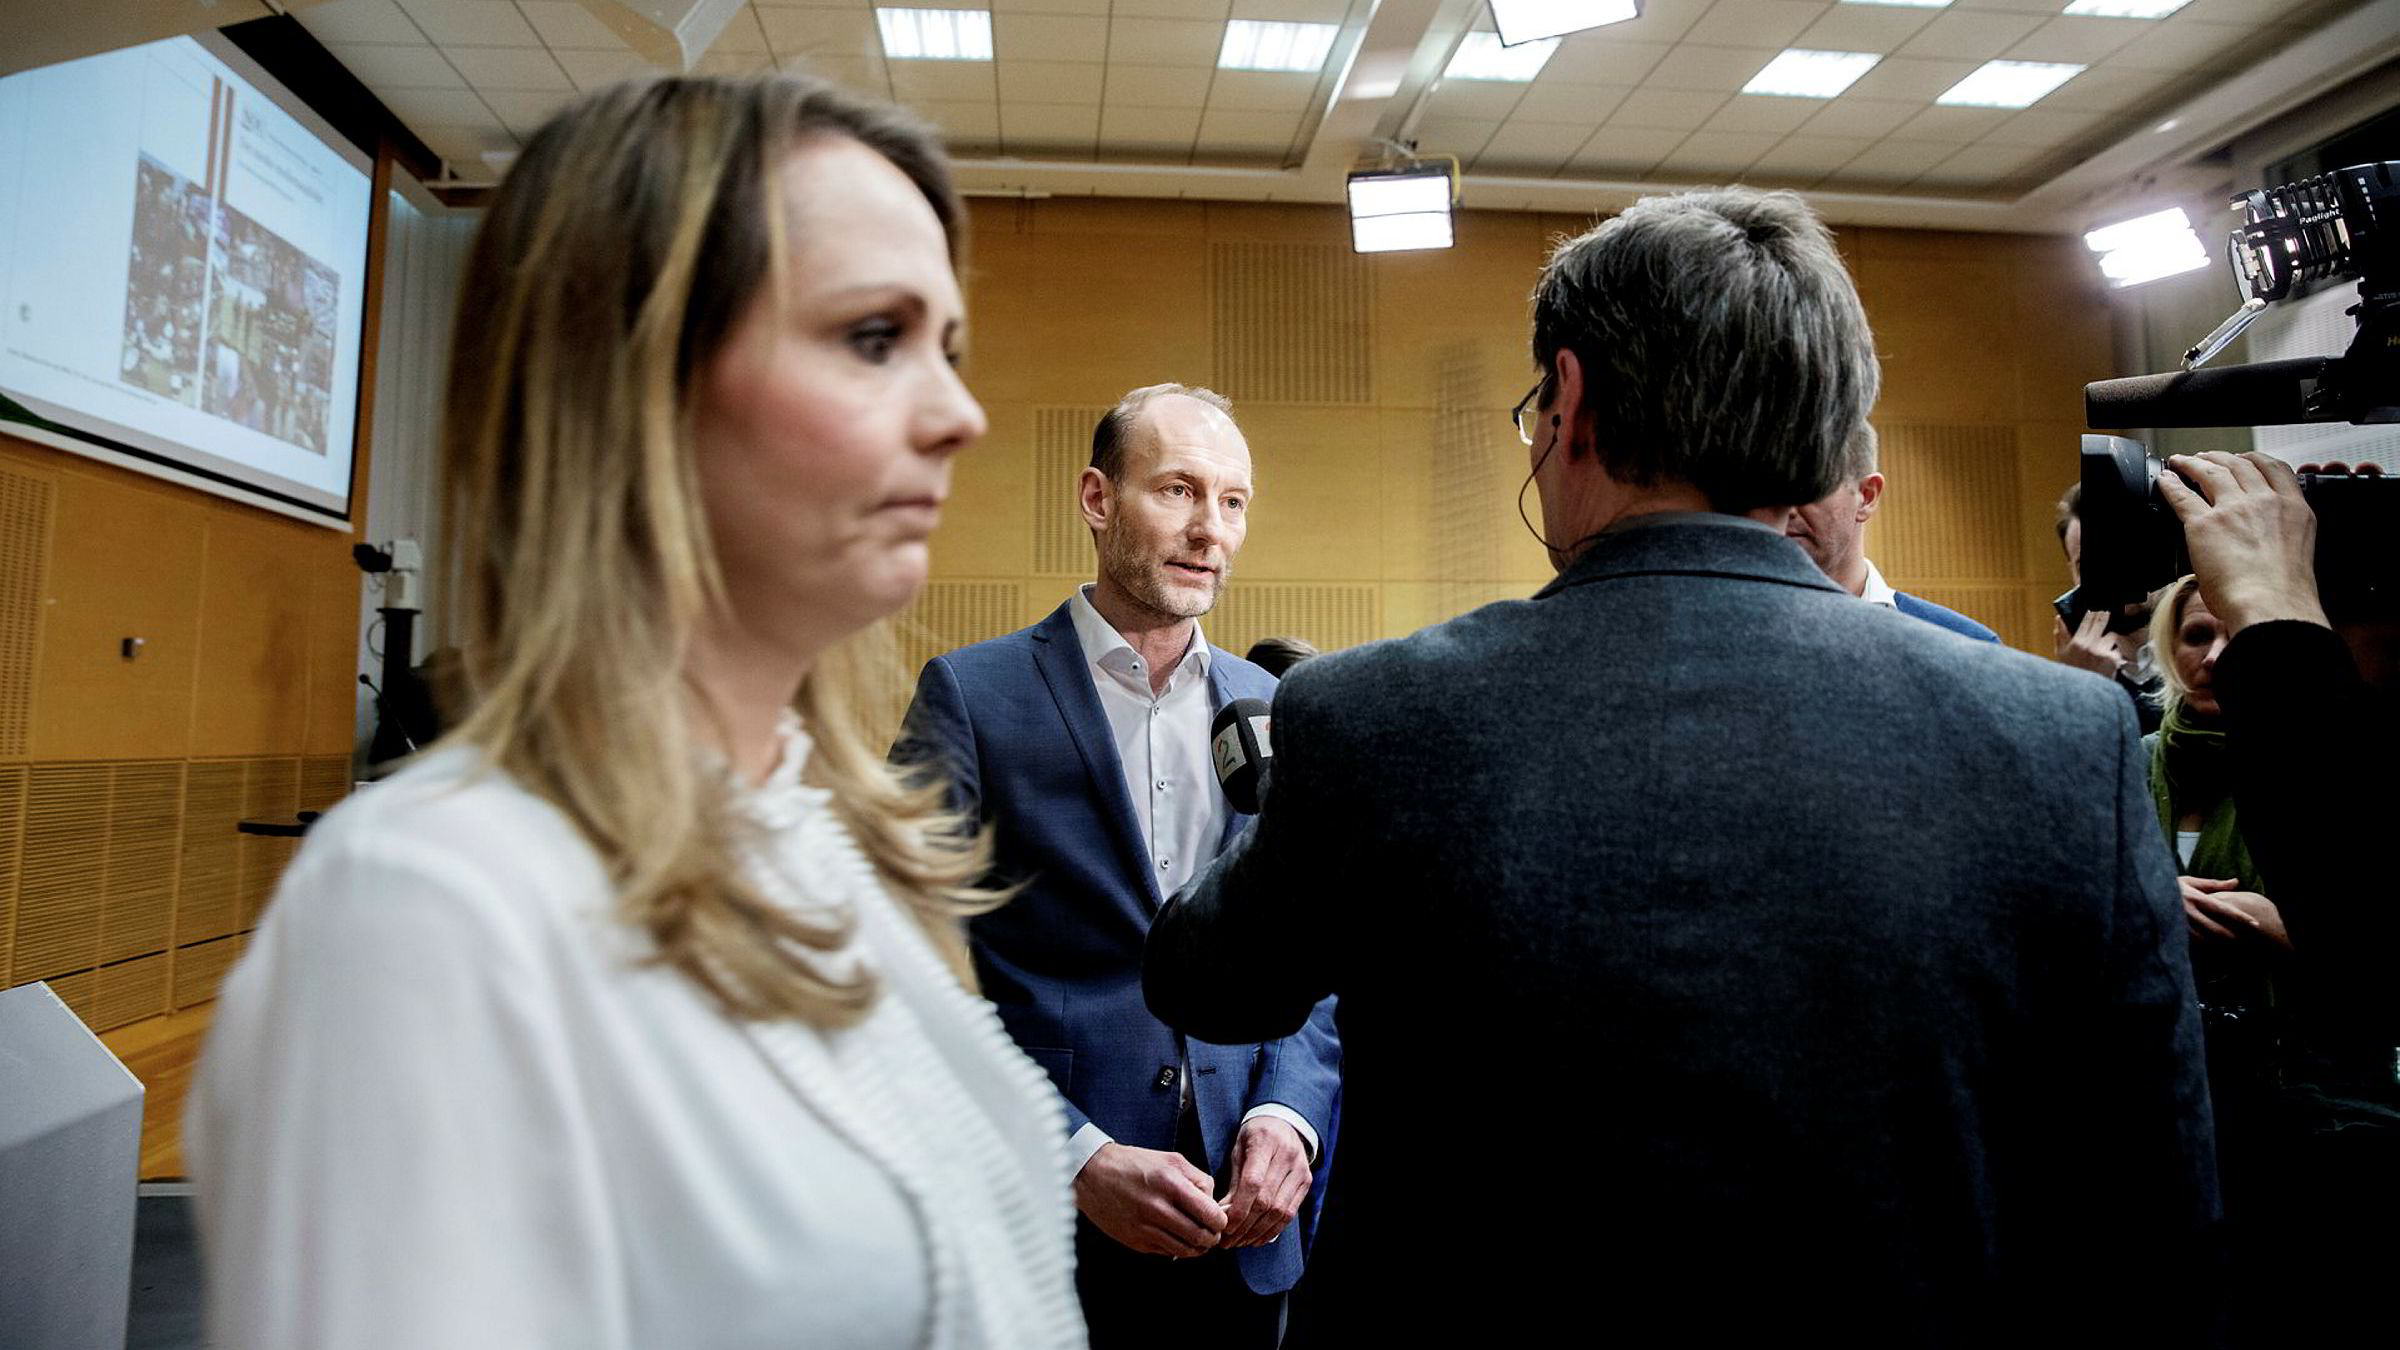 Knut Olav Åmås har ledet mediemangfoldsutvalget, som tirsdag overleverte sin rapport med forslag om mer støtte til mediene. Kulturminister Linda Hofstad Helleland syntes utvalget har tatt seg god råd.